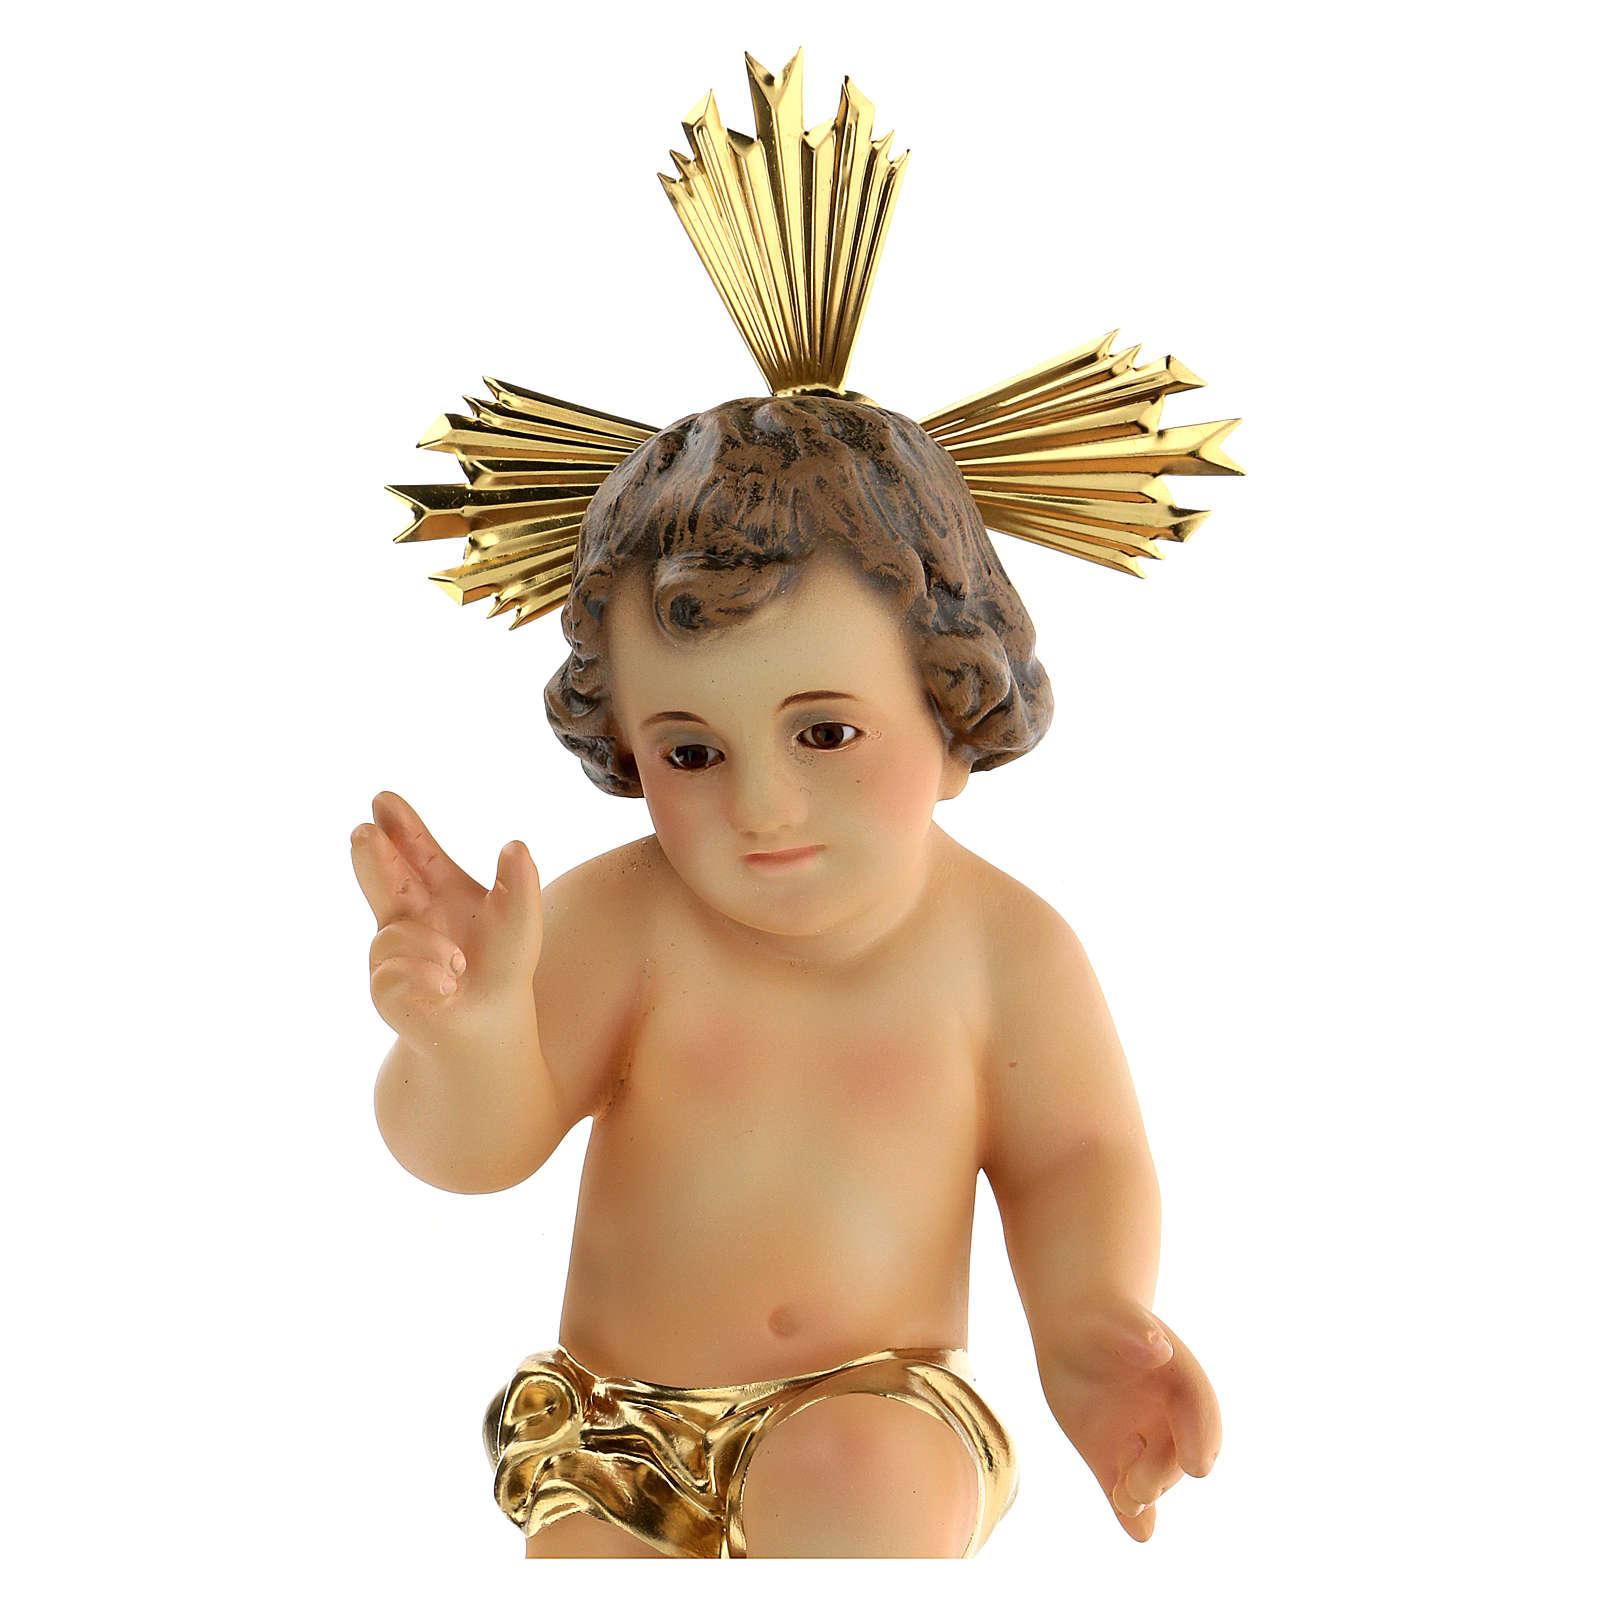 Gesù Bambino pasta legno benedicente vestina dorata dec. elegan 3